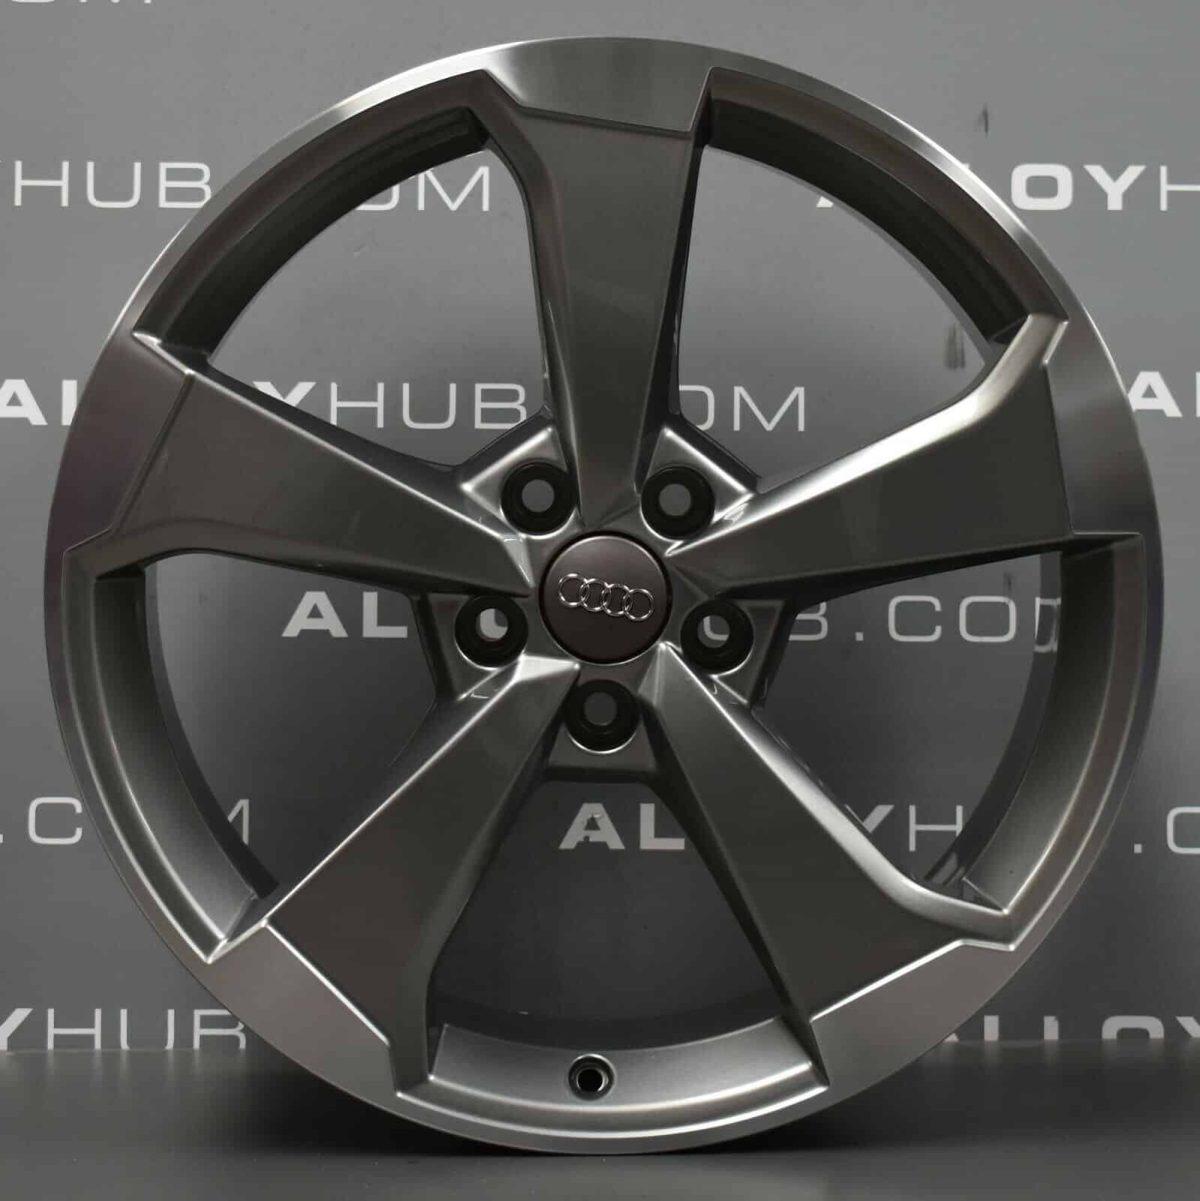 "Genuine Audi RS3/S3/A3 8V 5 Spoke 19"" Inch Alloy Wheels with Grey & Diamond Turned Finish 8V0 601 025 CF"